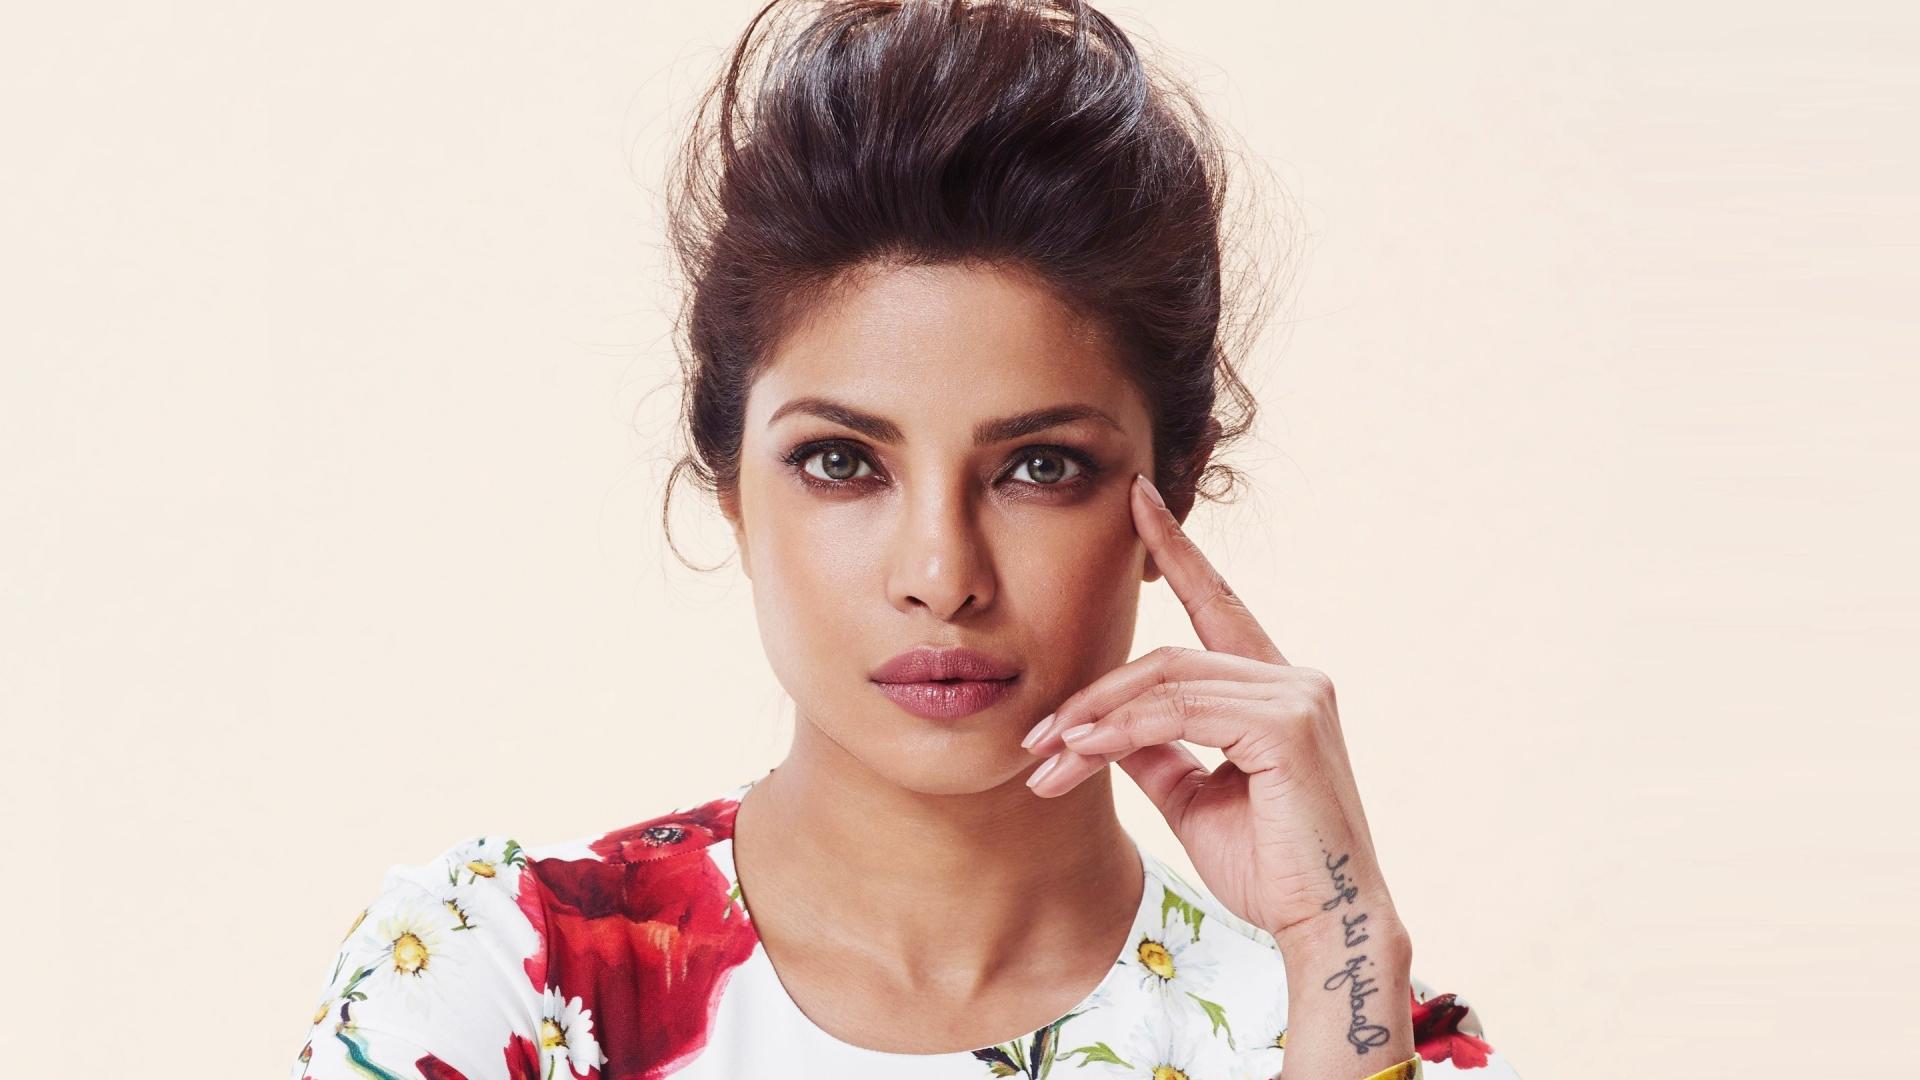 download 1920x1080 wallpaper priyanka chopra actress tattoo on hand bollywood full hd hdtv fhd 1080p 1920x1080 hd image background 10602 hd hdtv fhd 1080p 1920x1080 hd